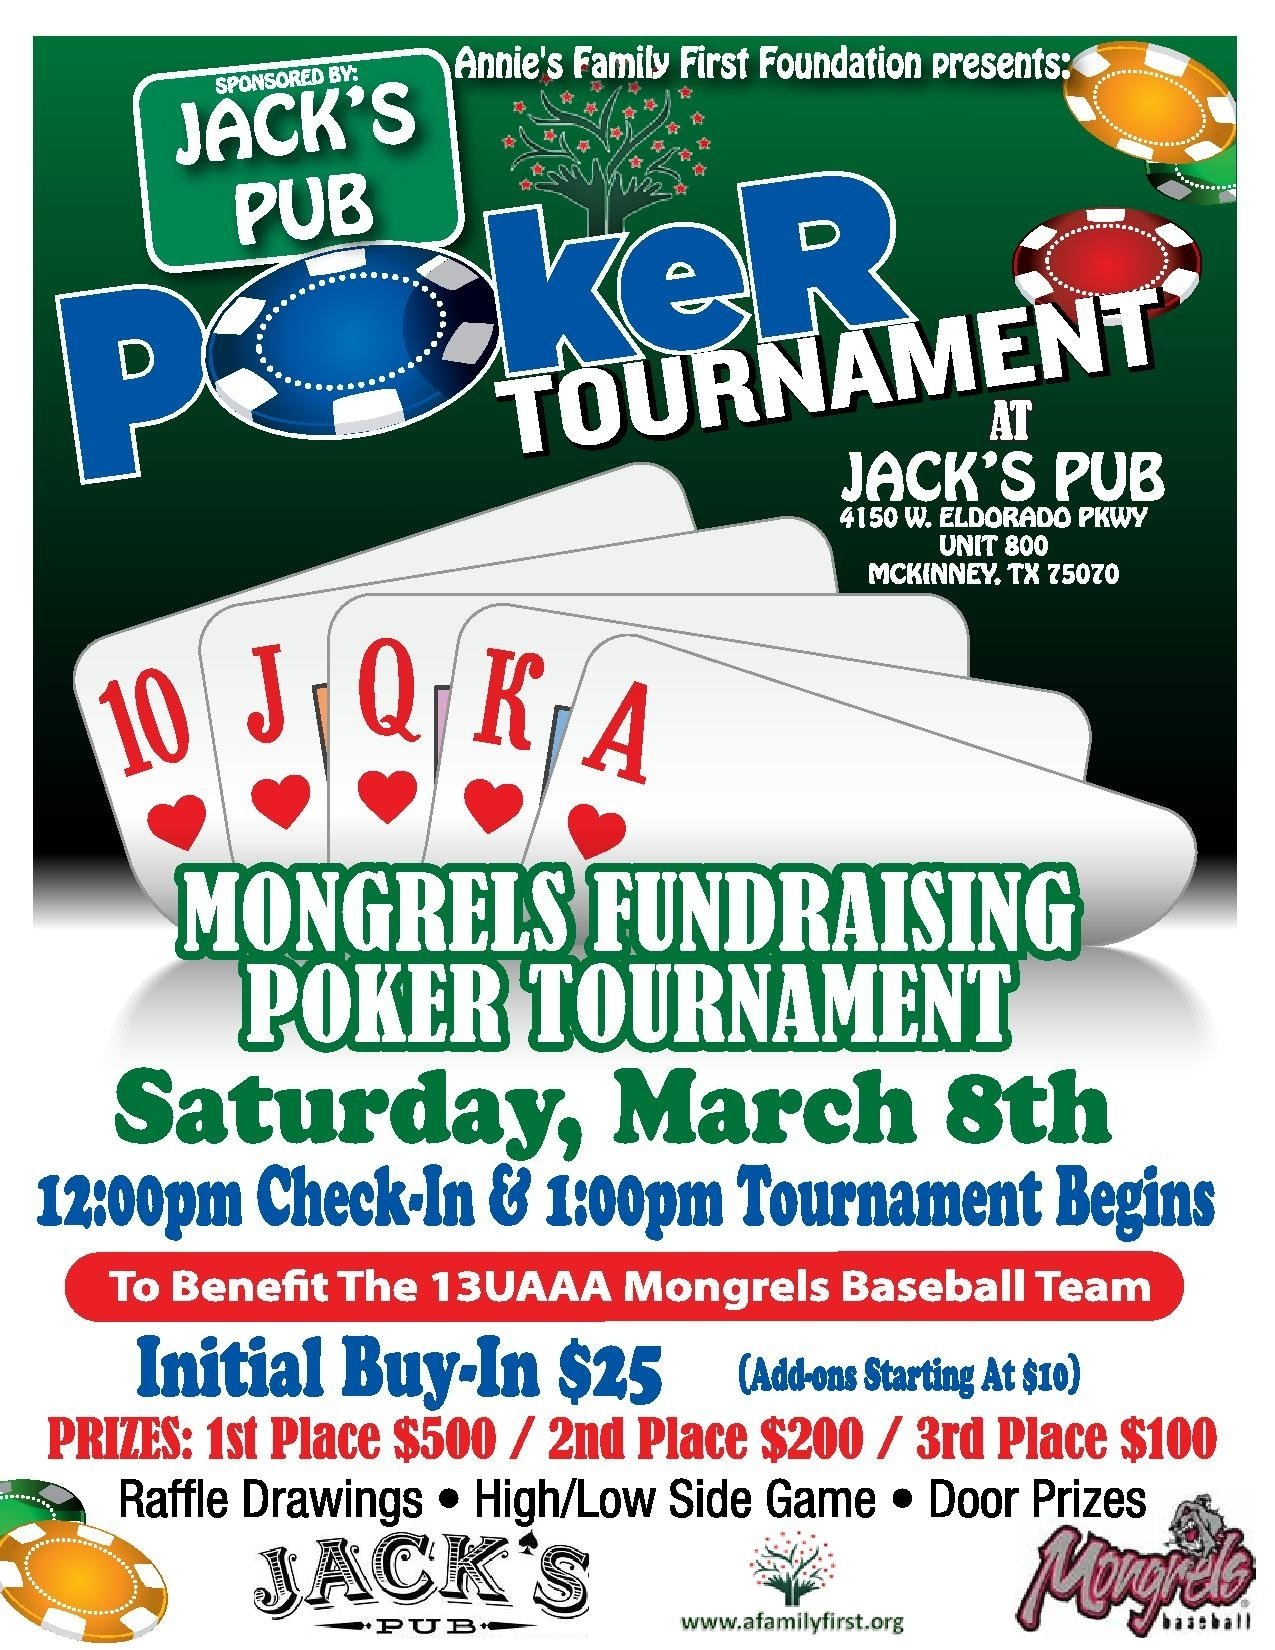 poker fundraising tournament benefitting the 13uaaa mckinney